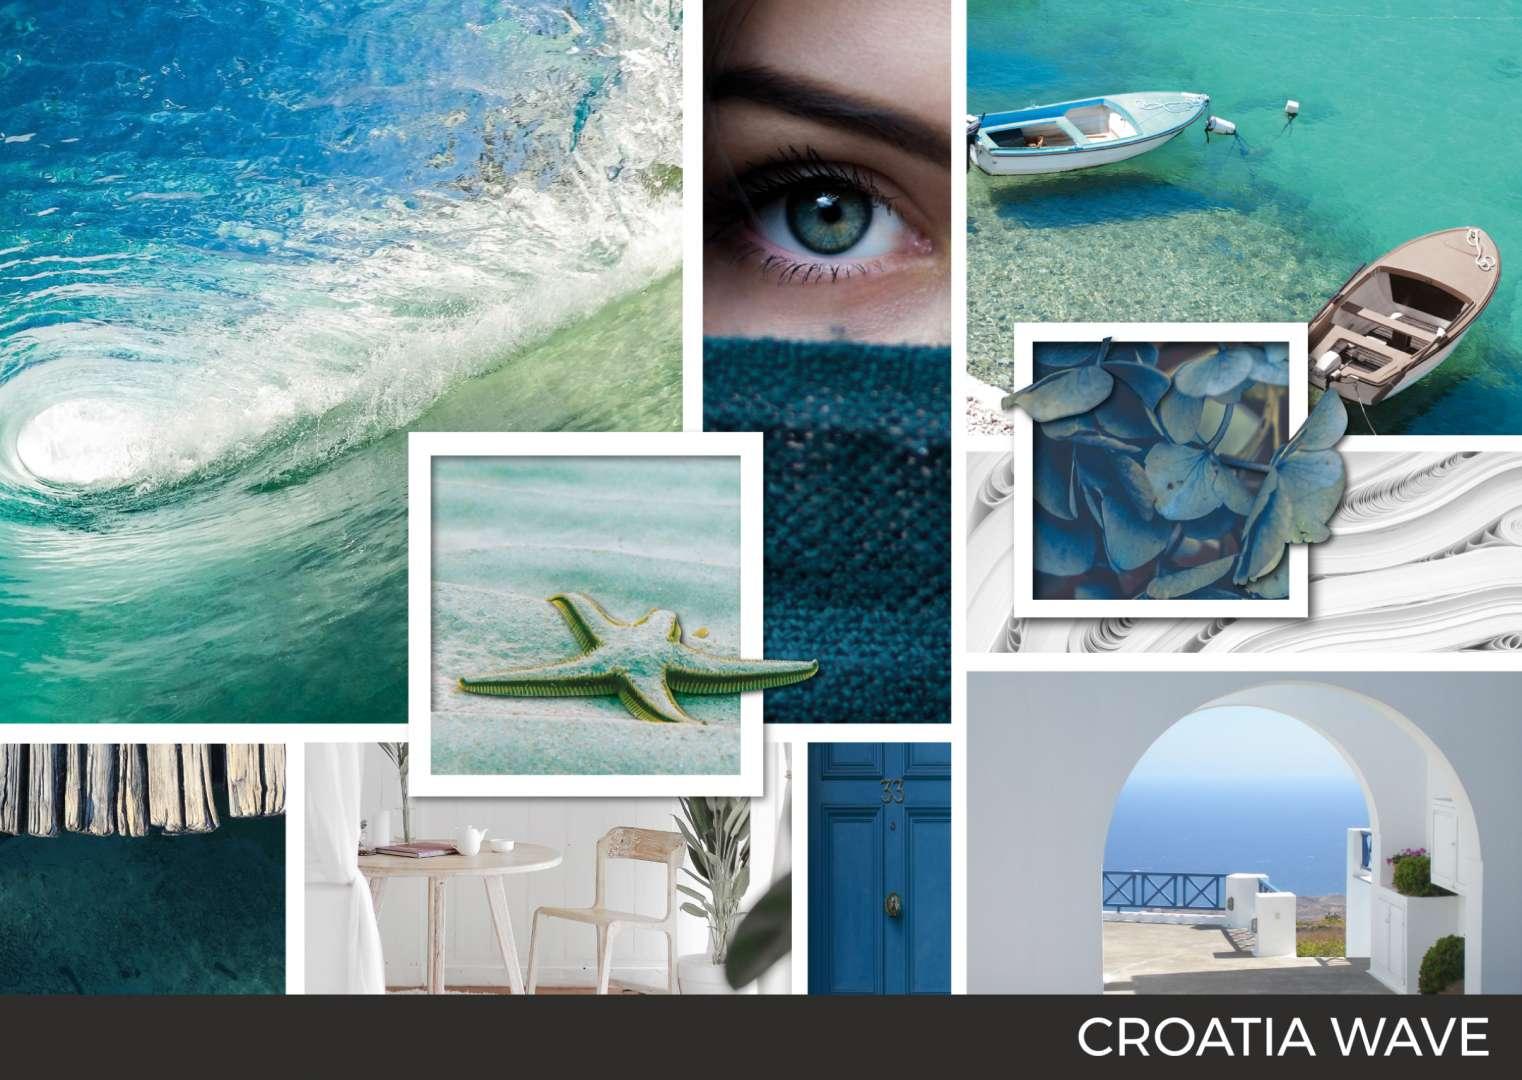 Croatia Wave